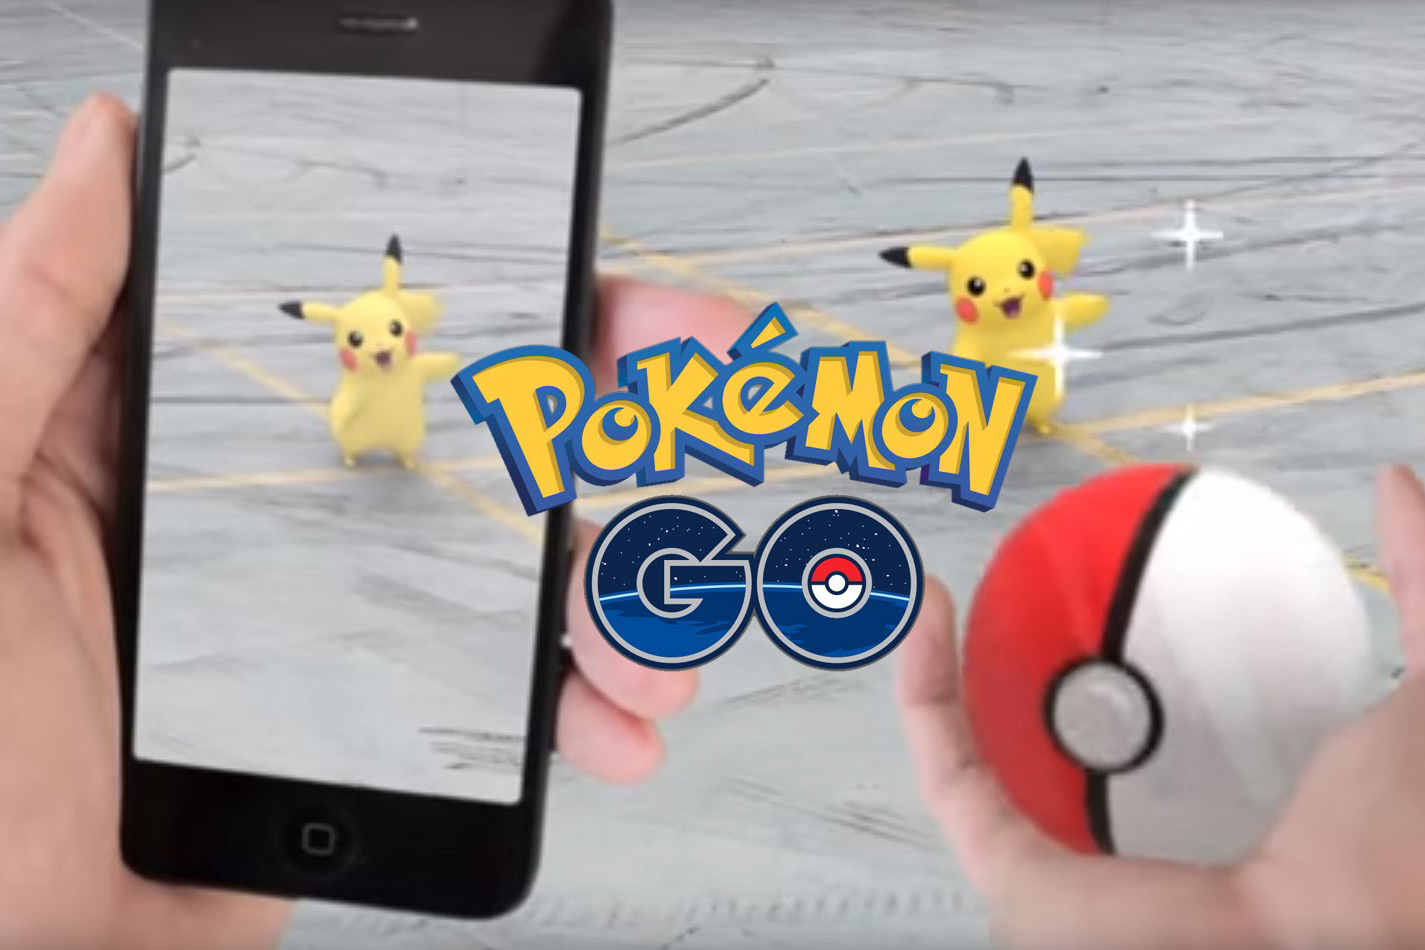 'Pokémon Go' Is Already a Cultural Phenomenon